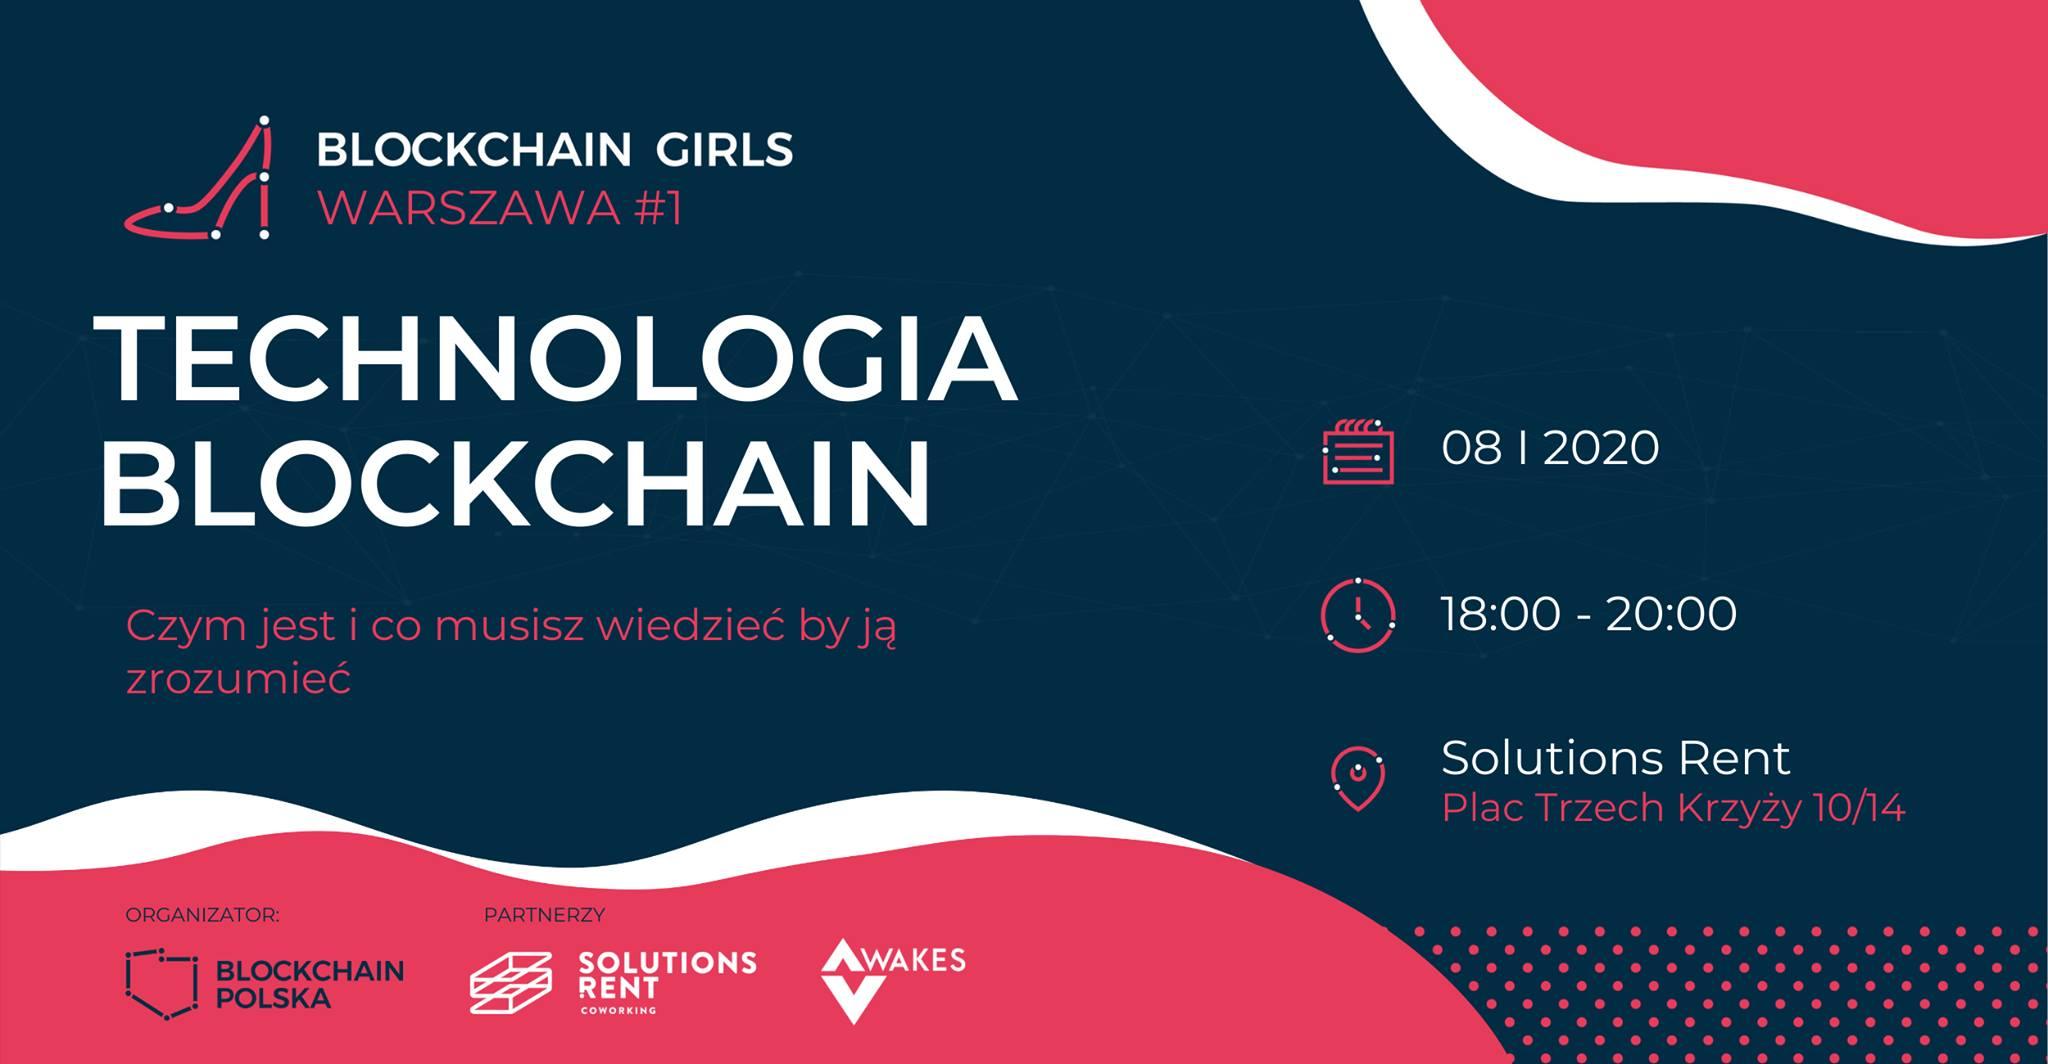 blockchain girls warszawa